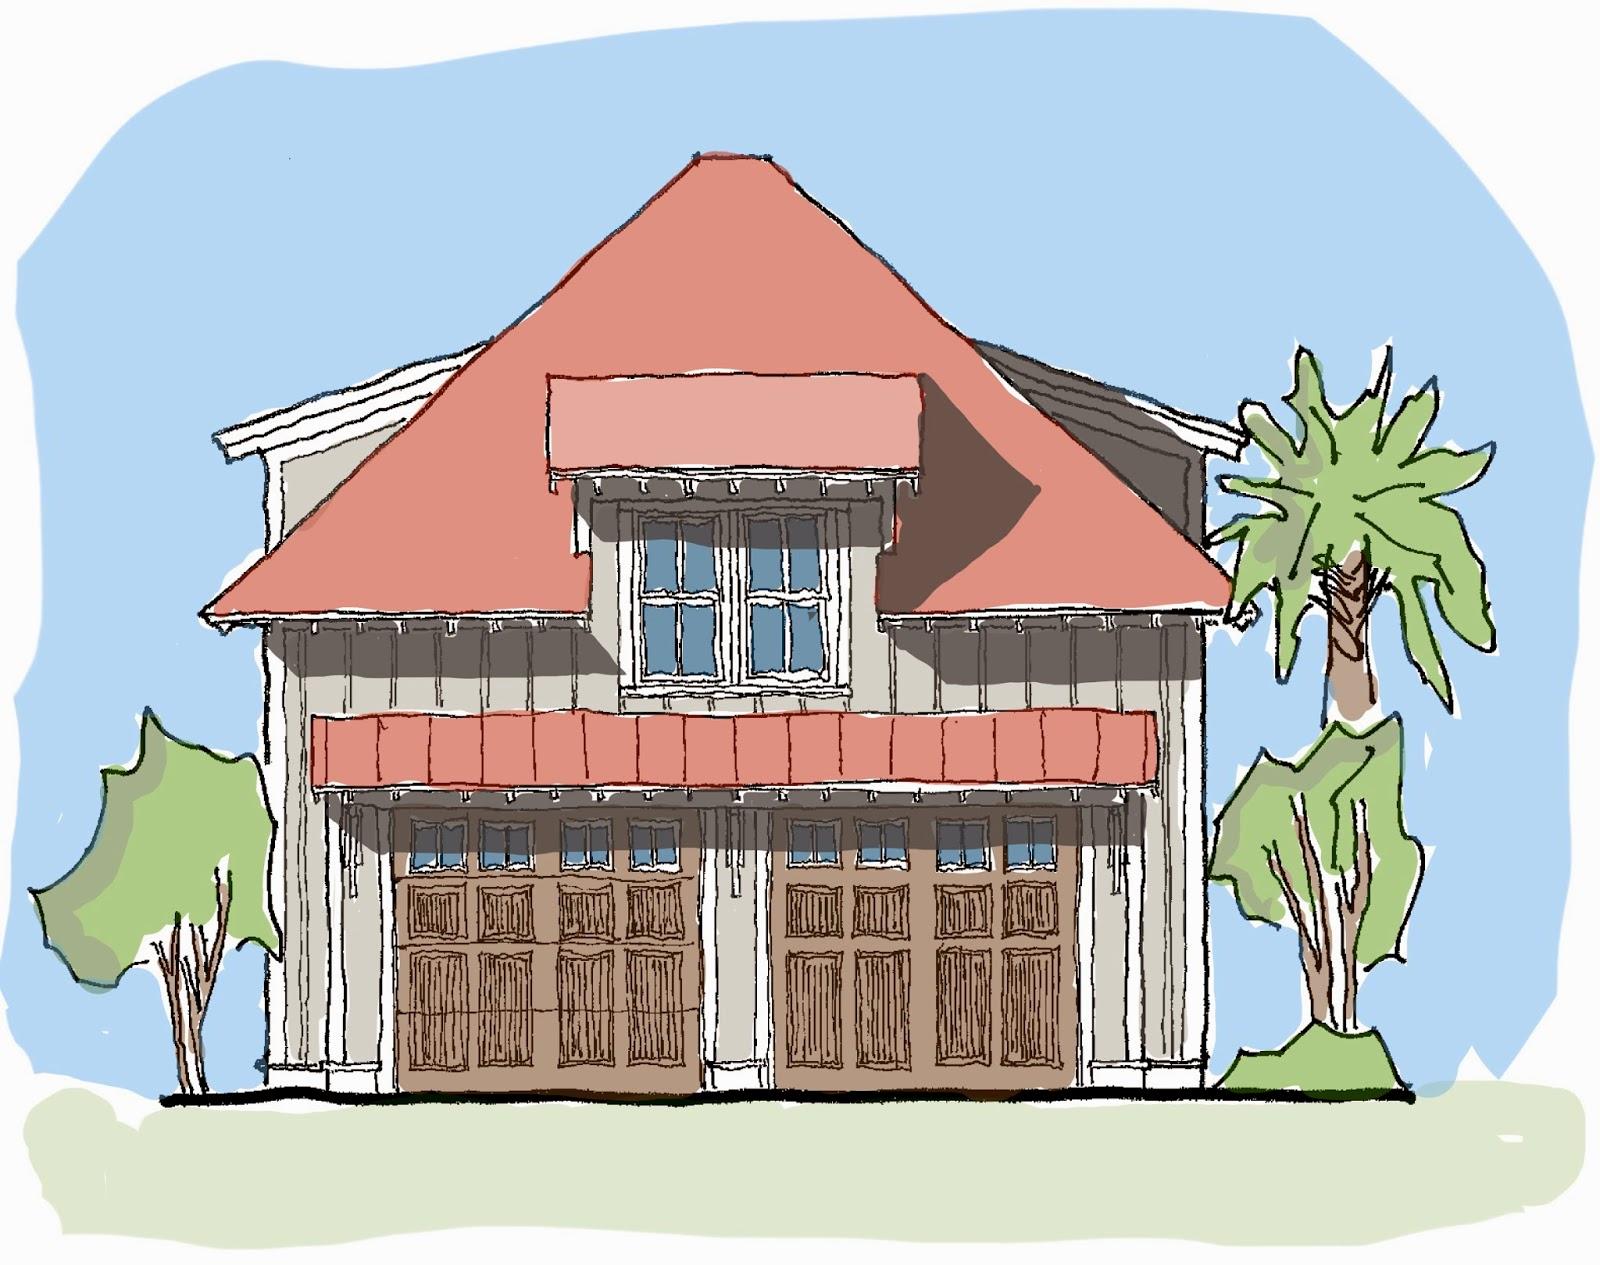 house plan fox sparrow 6 plan by flatfish island designs and sparrow garage 5 by flatfish island designs